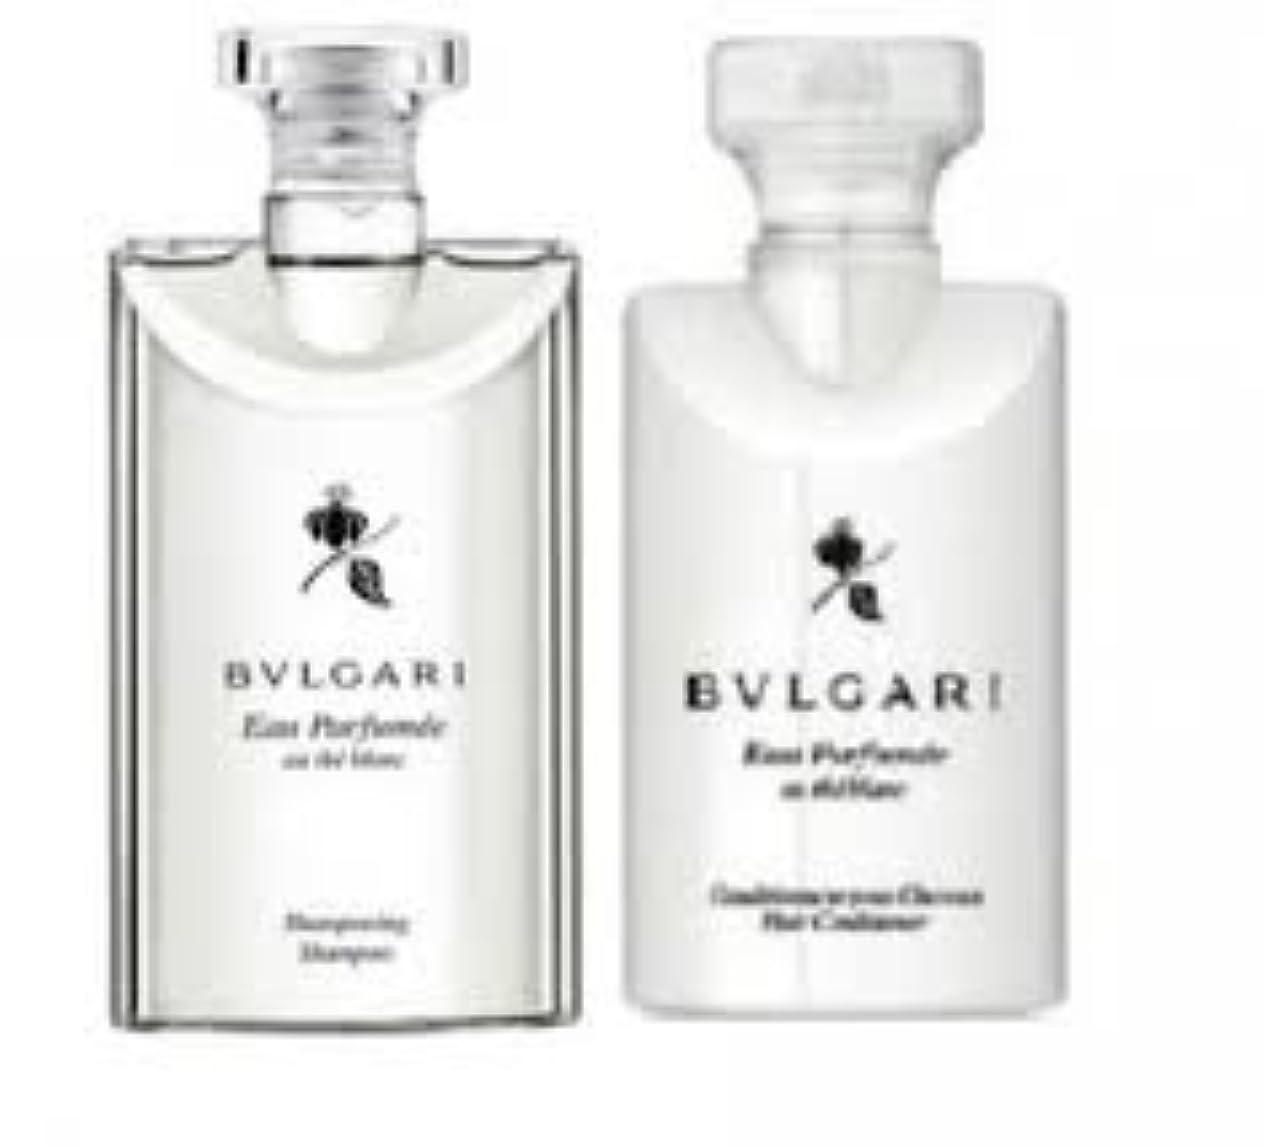 Bvlgari Eau Parfumee Au The Blanc (ブルガリ オー パフュ-メ オウ ブラン) 2.5 oz (75ml) シャンプー & ヘアーコンディショナー